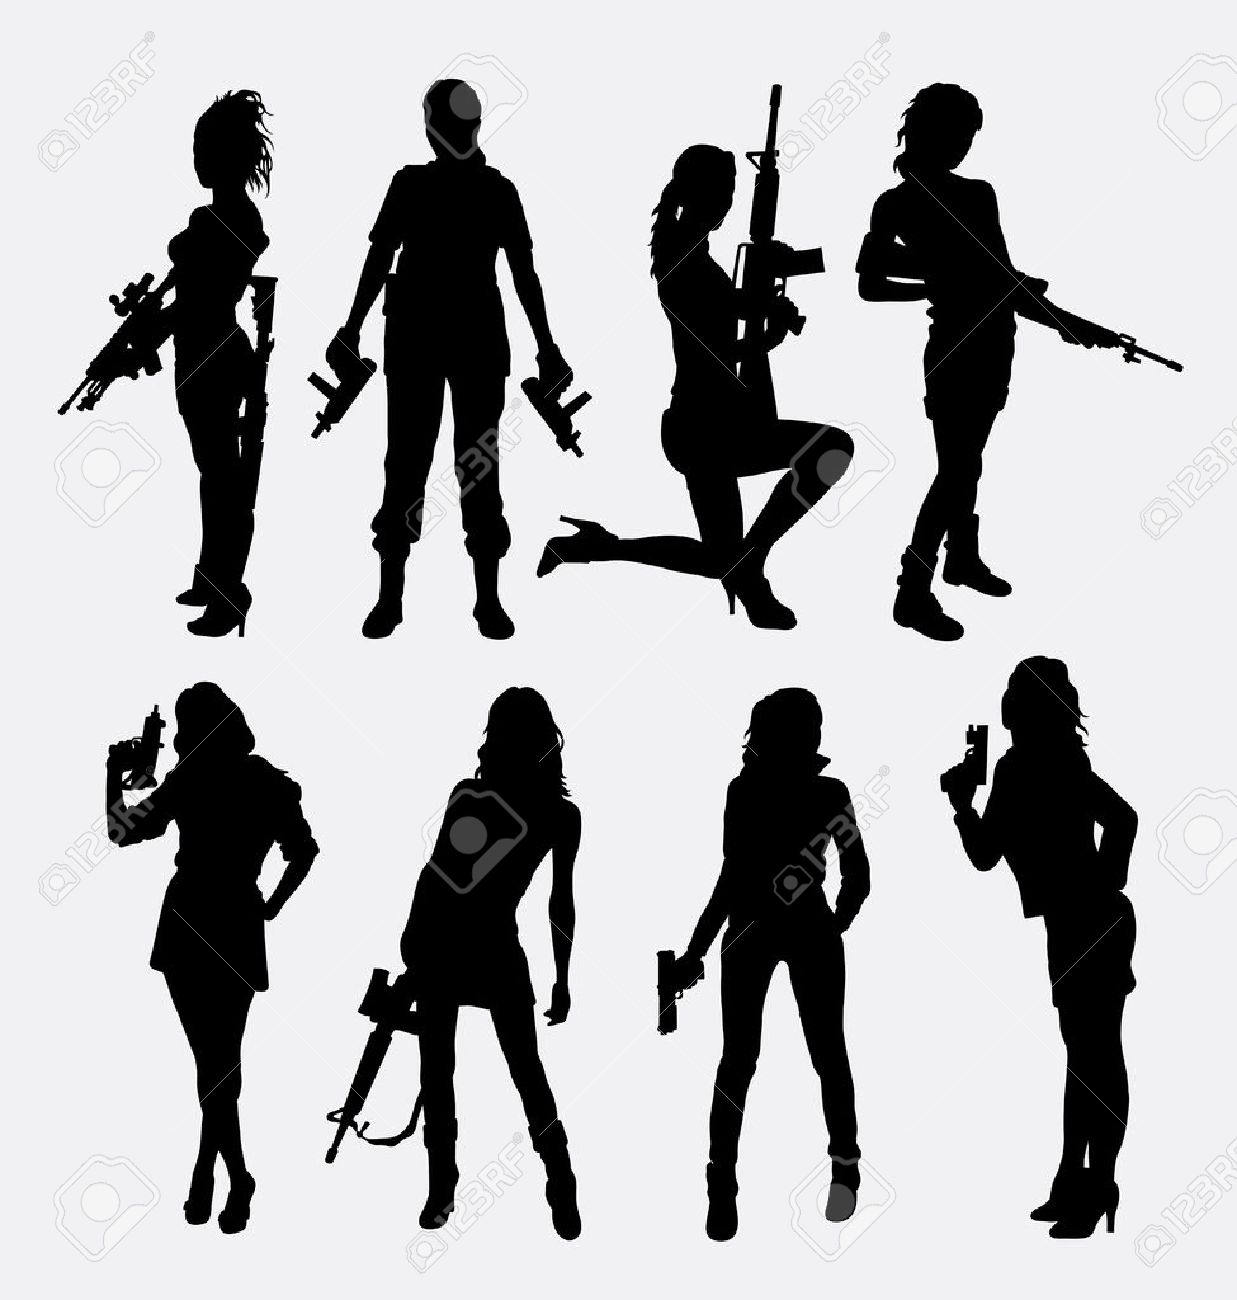 Woman and gun silhouettes. - 53381927